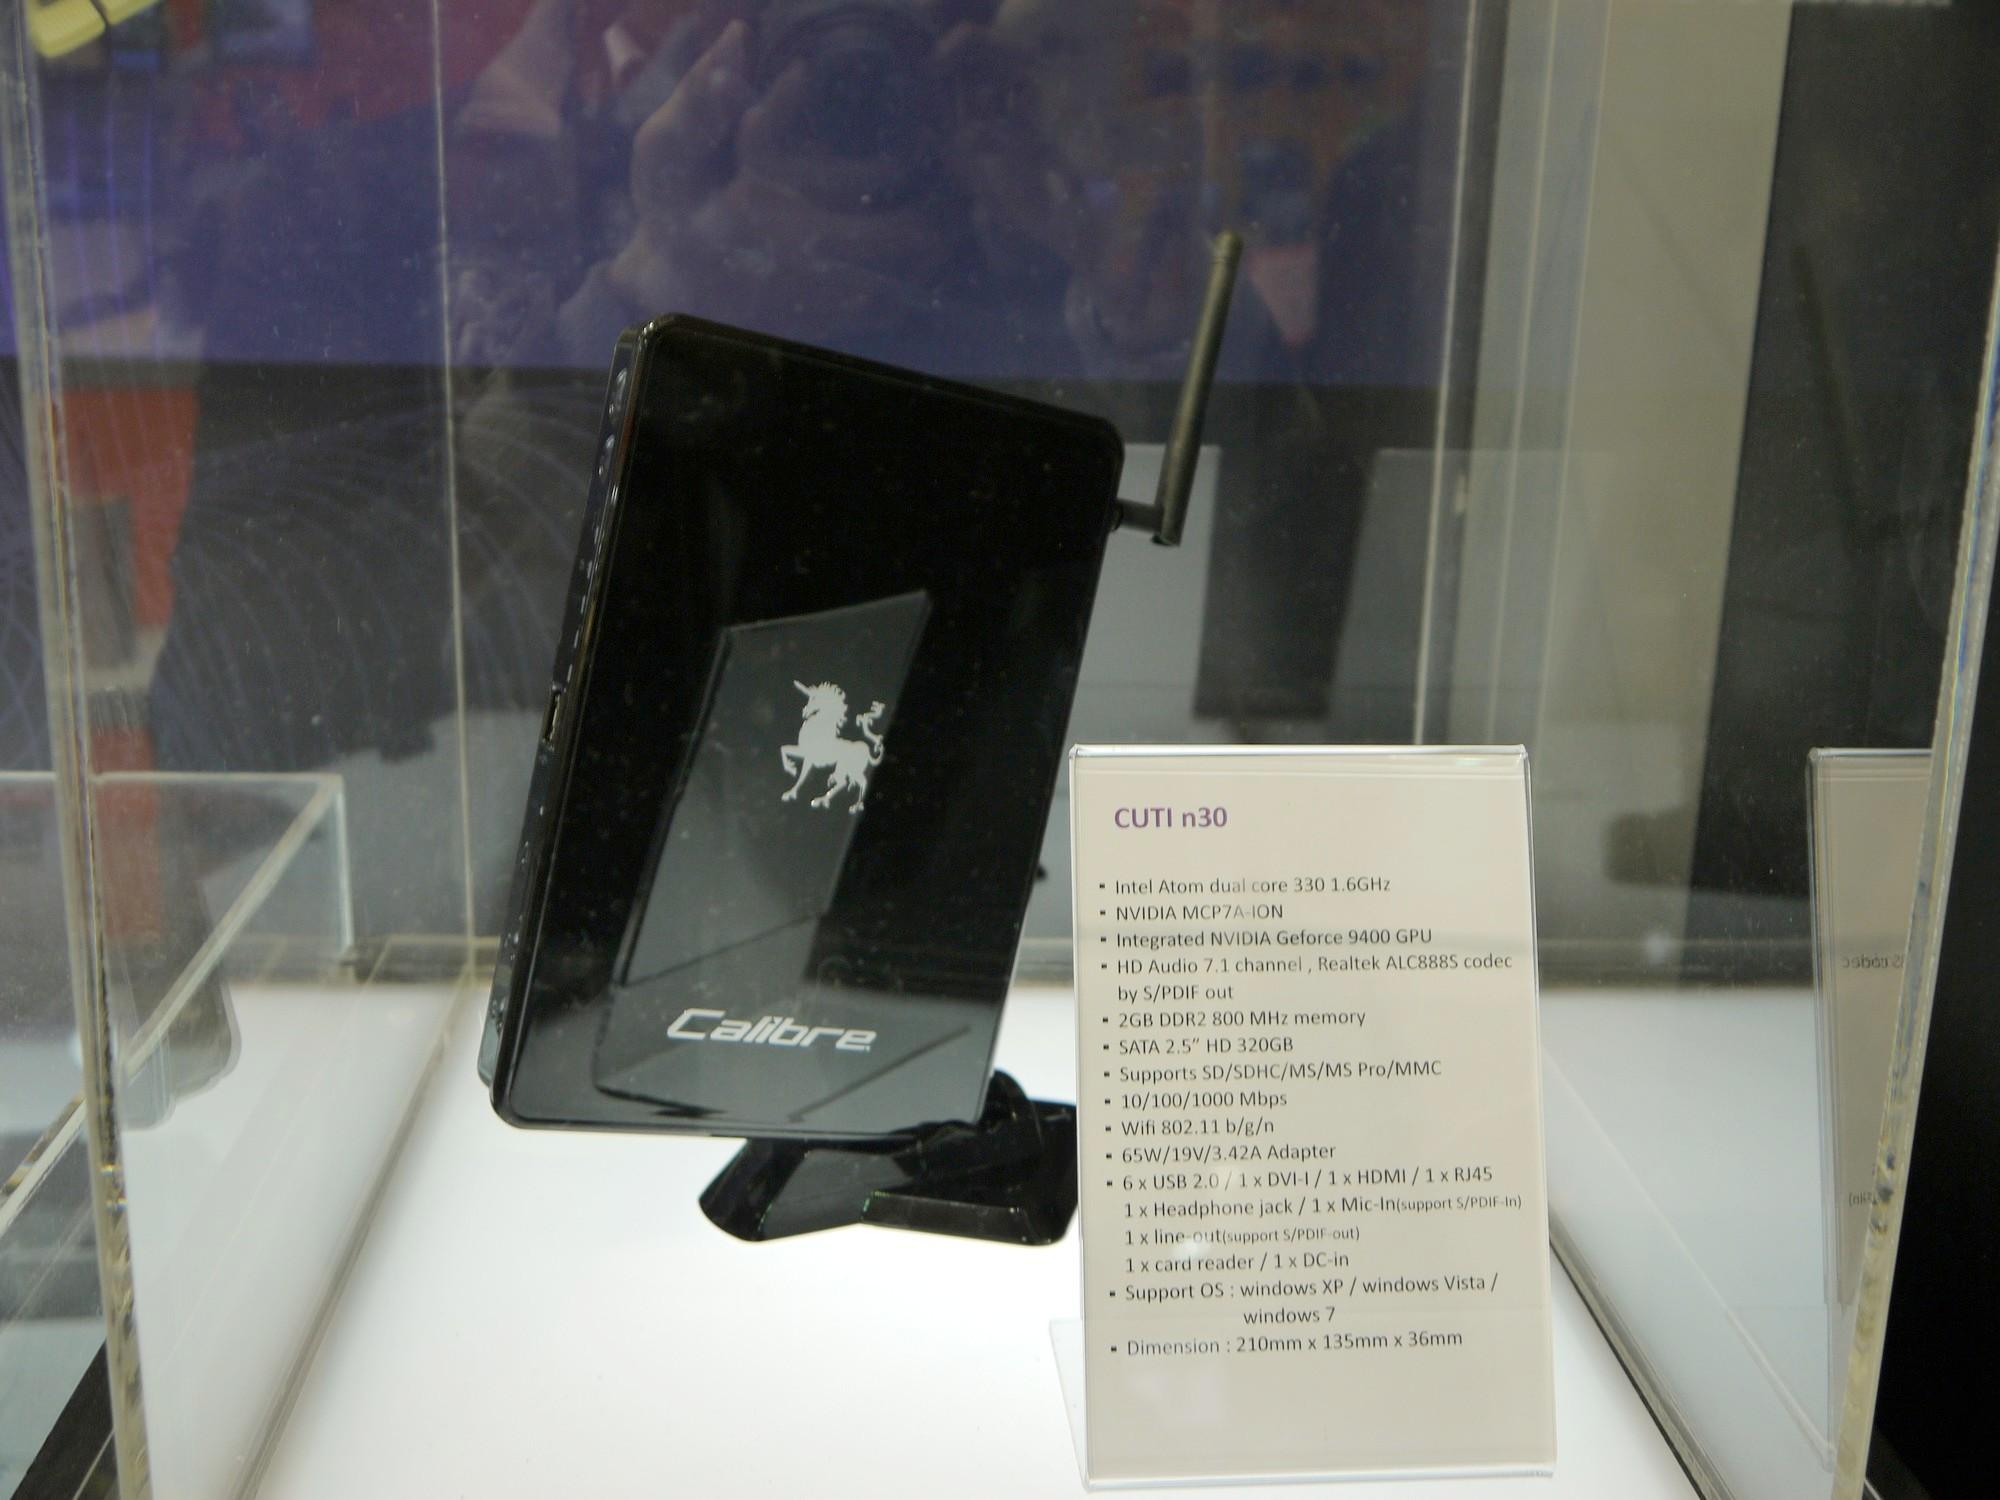 P1020617.JPG